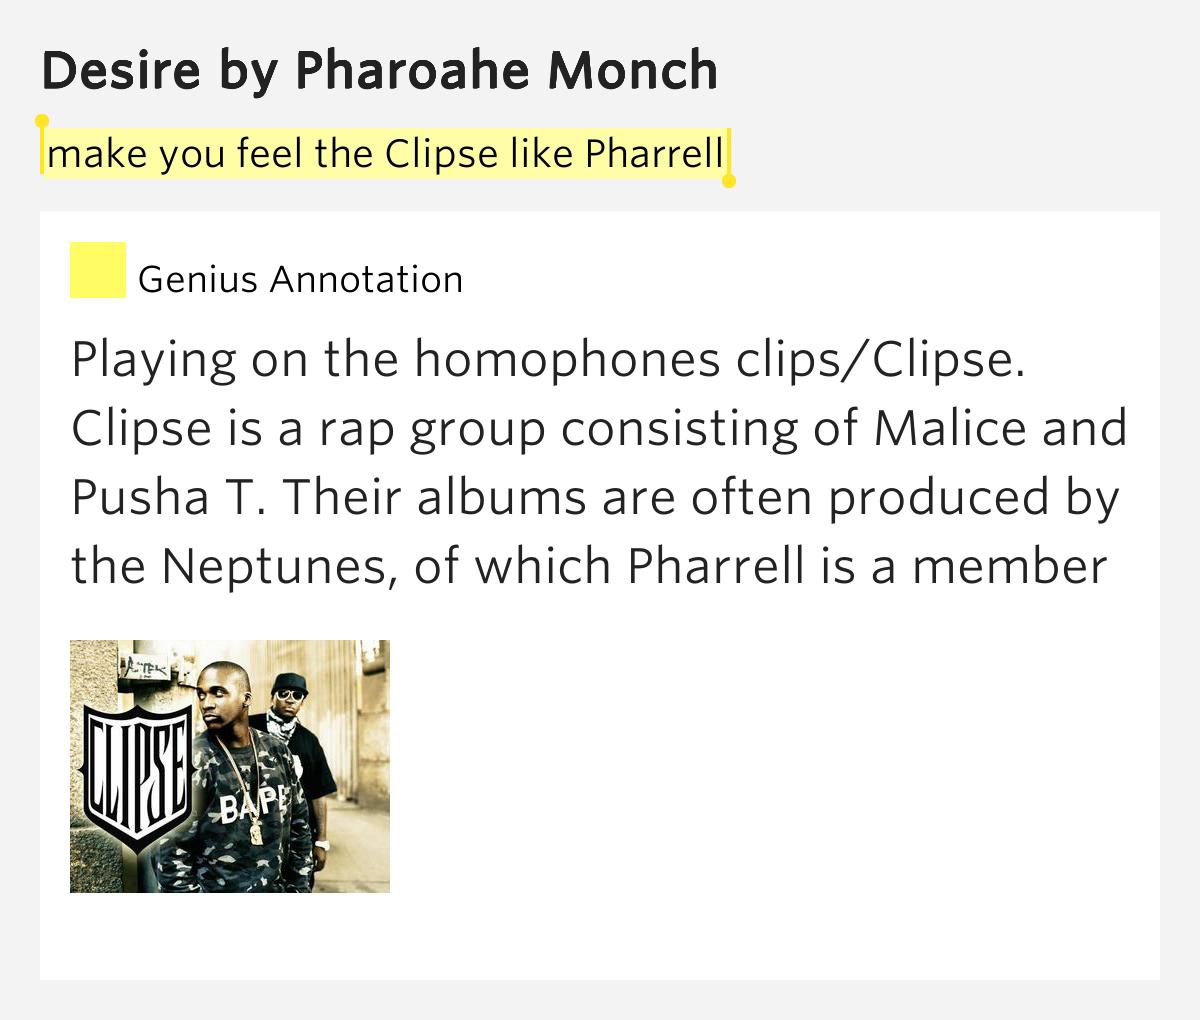 Make you feel the clipse like pharrell desire lyrics meaning for Desire miroir miroir lyrics